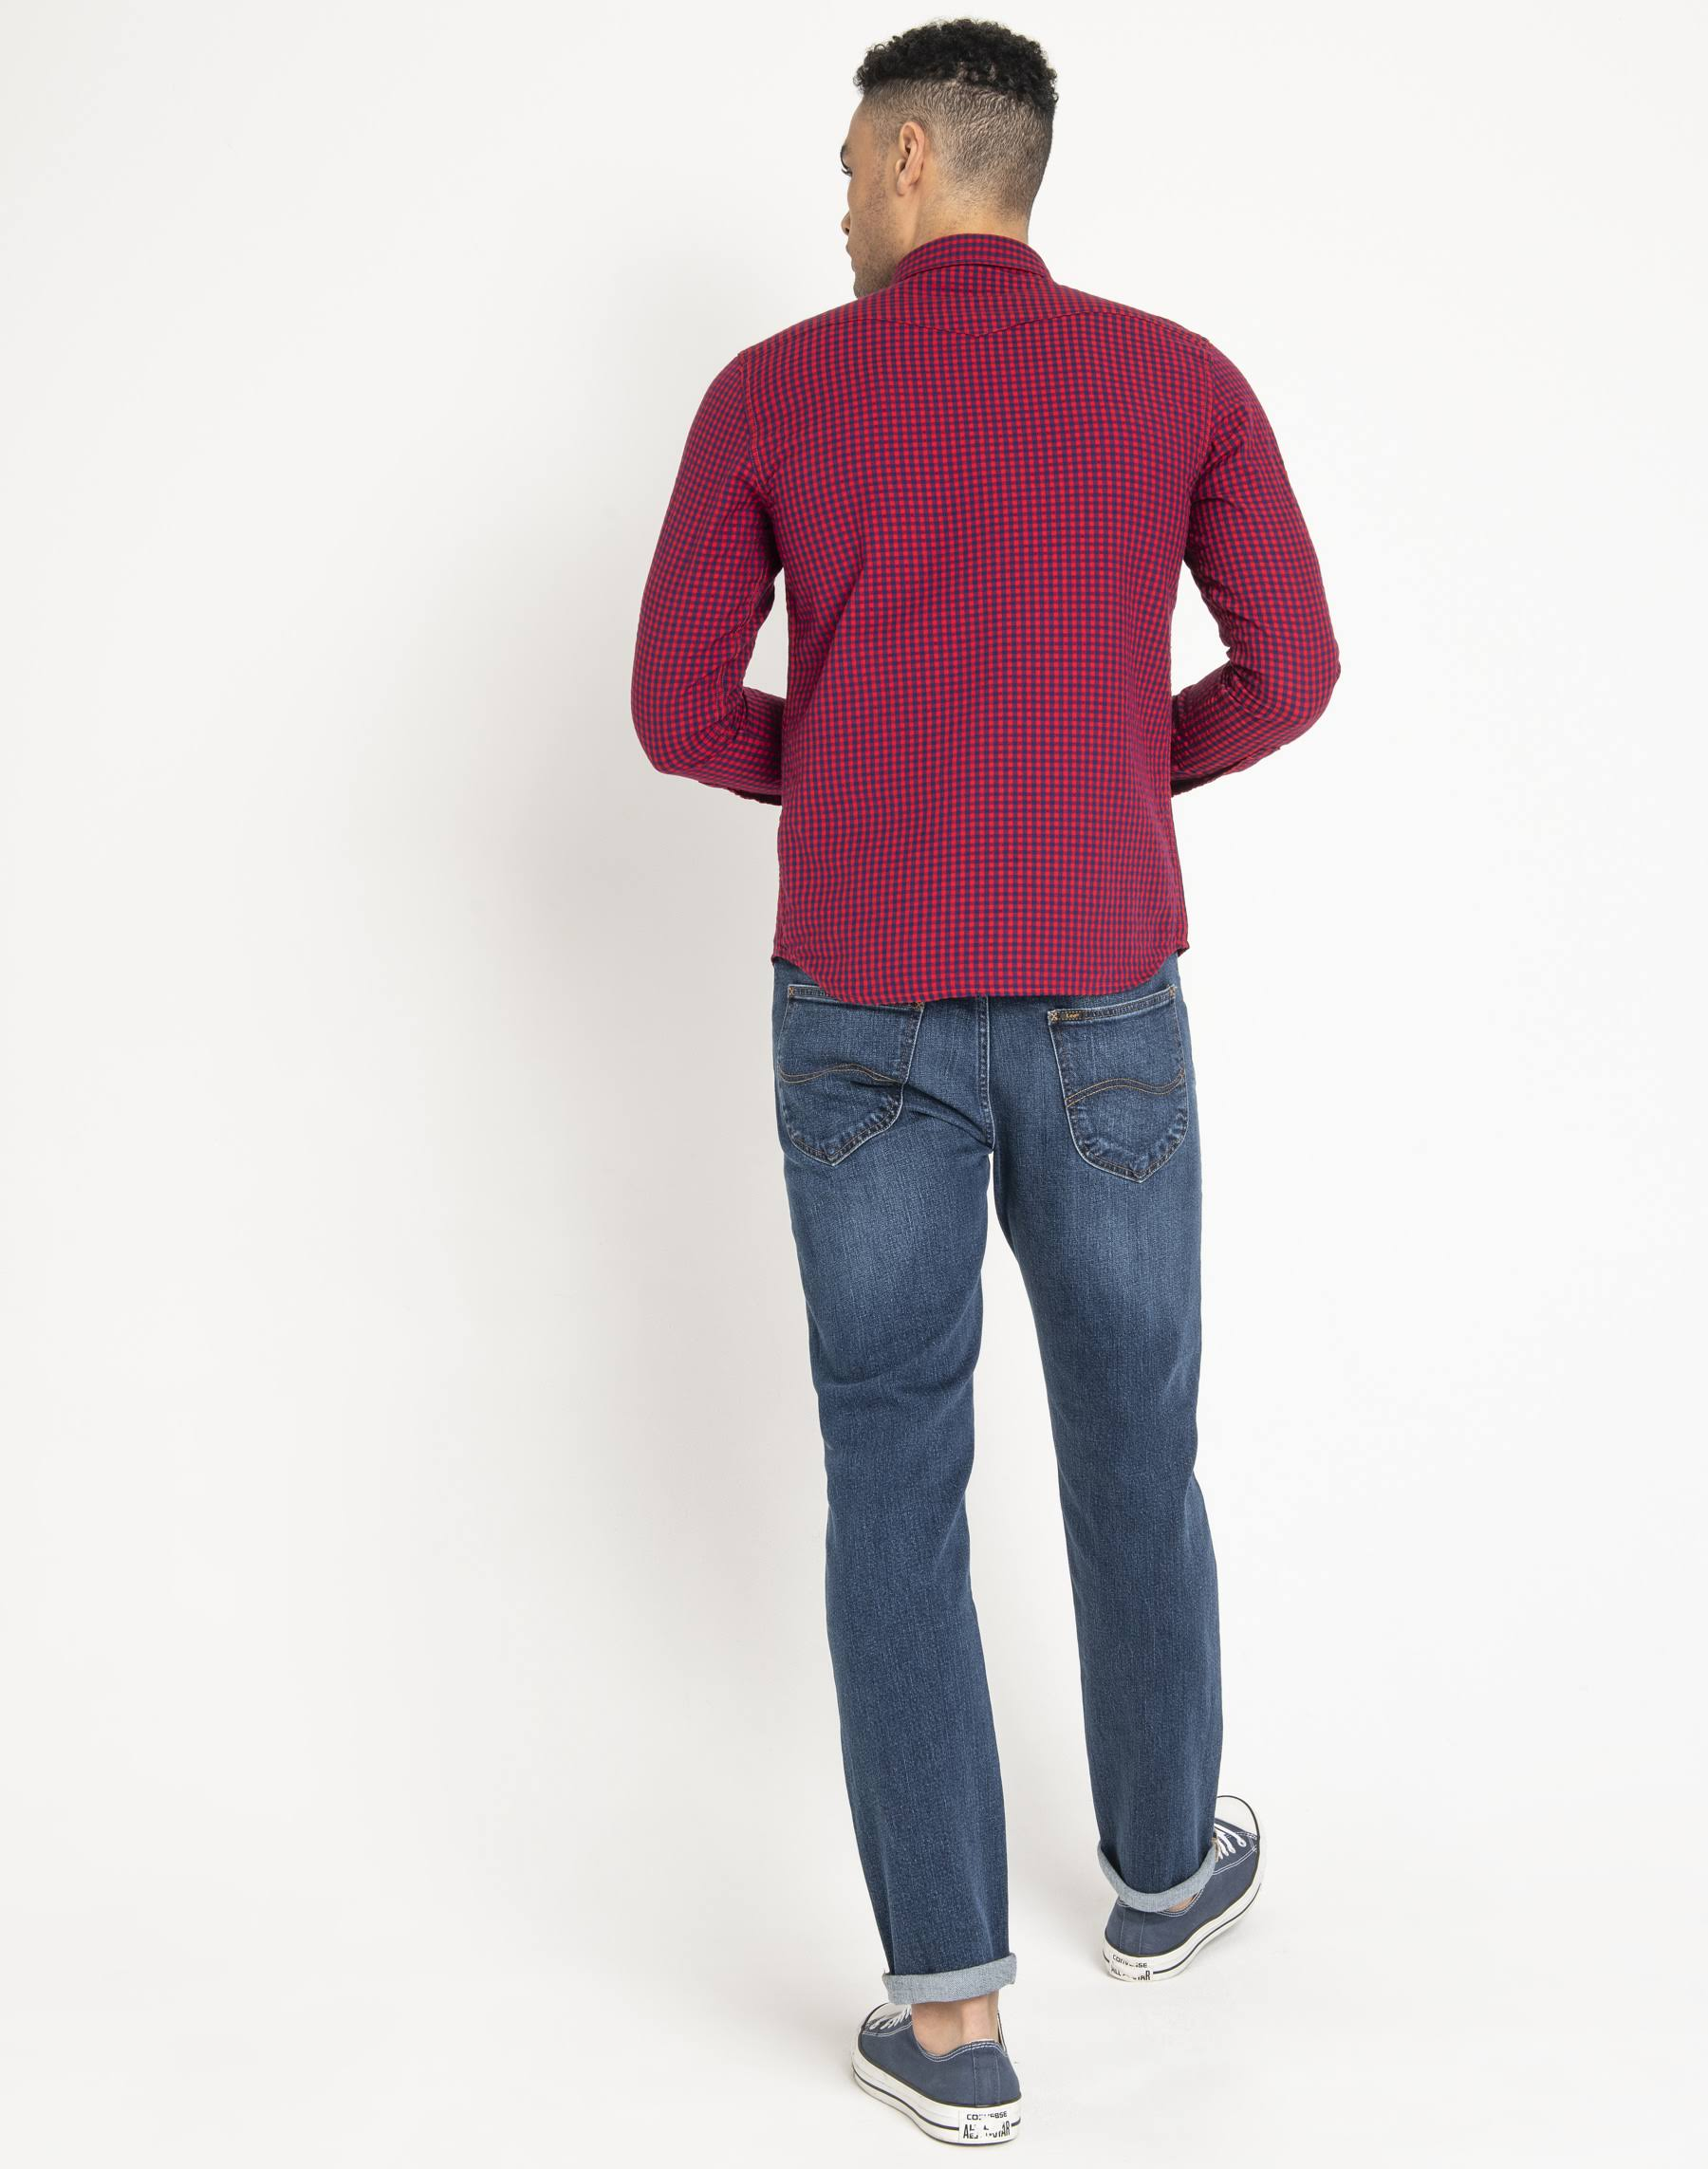 Western L Shirt Lee Rojo Talla Hombre Brillante dYw5qw